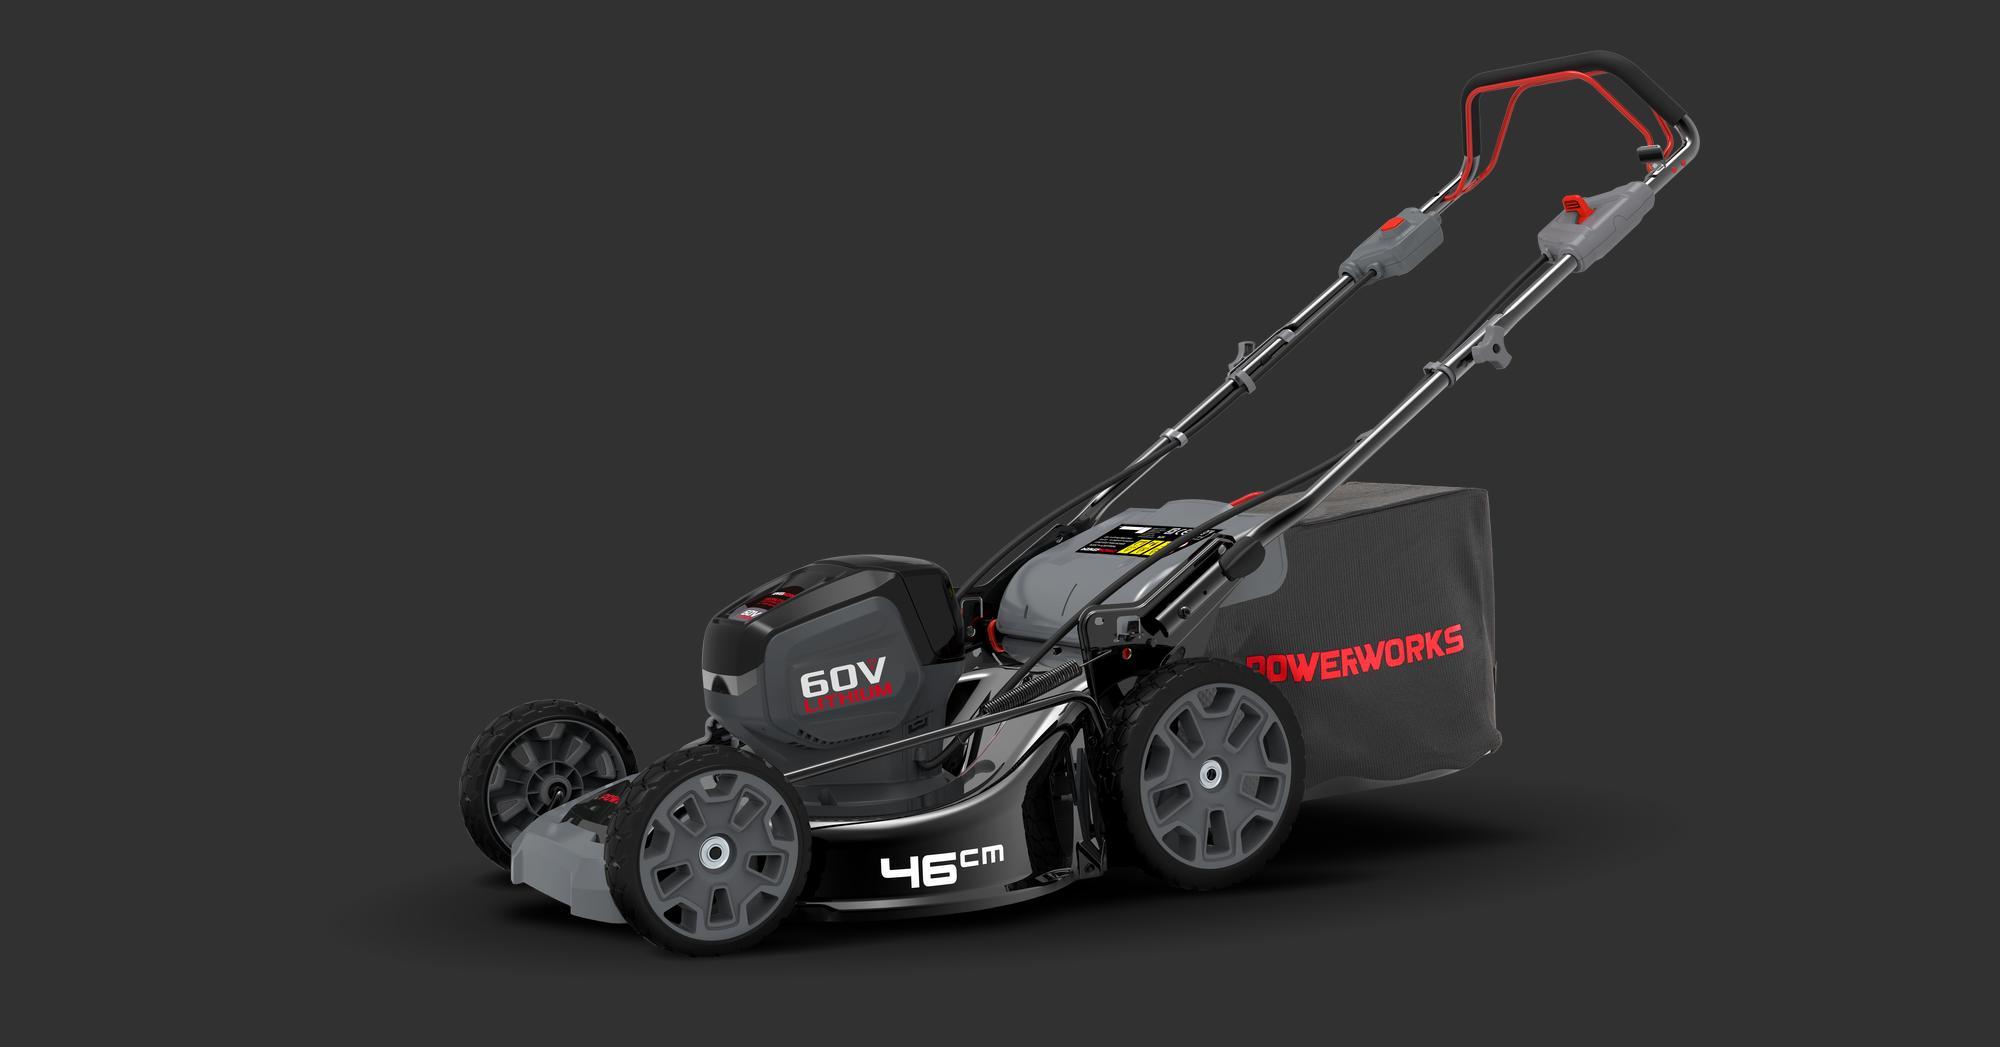 Powerworks Lawn Mower 46 Cm Sp